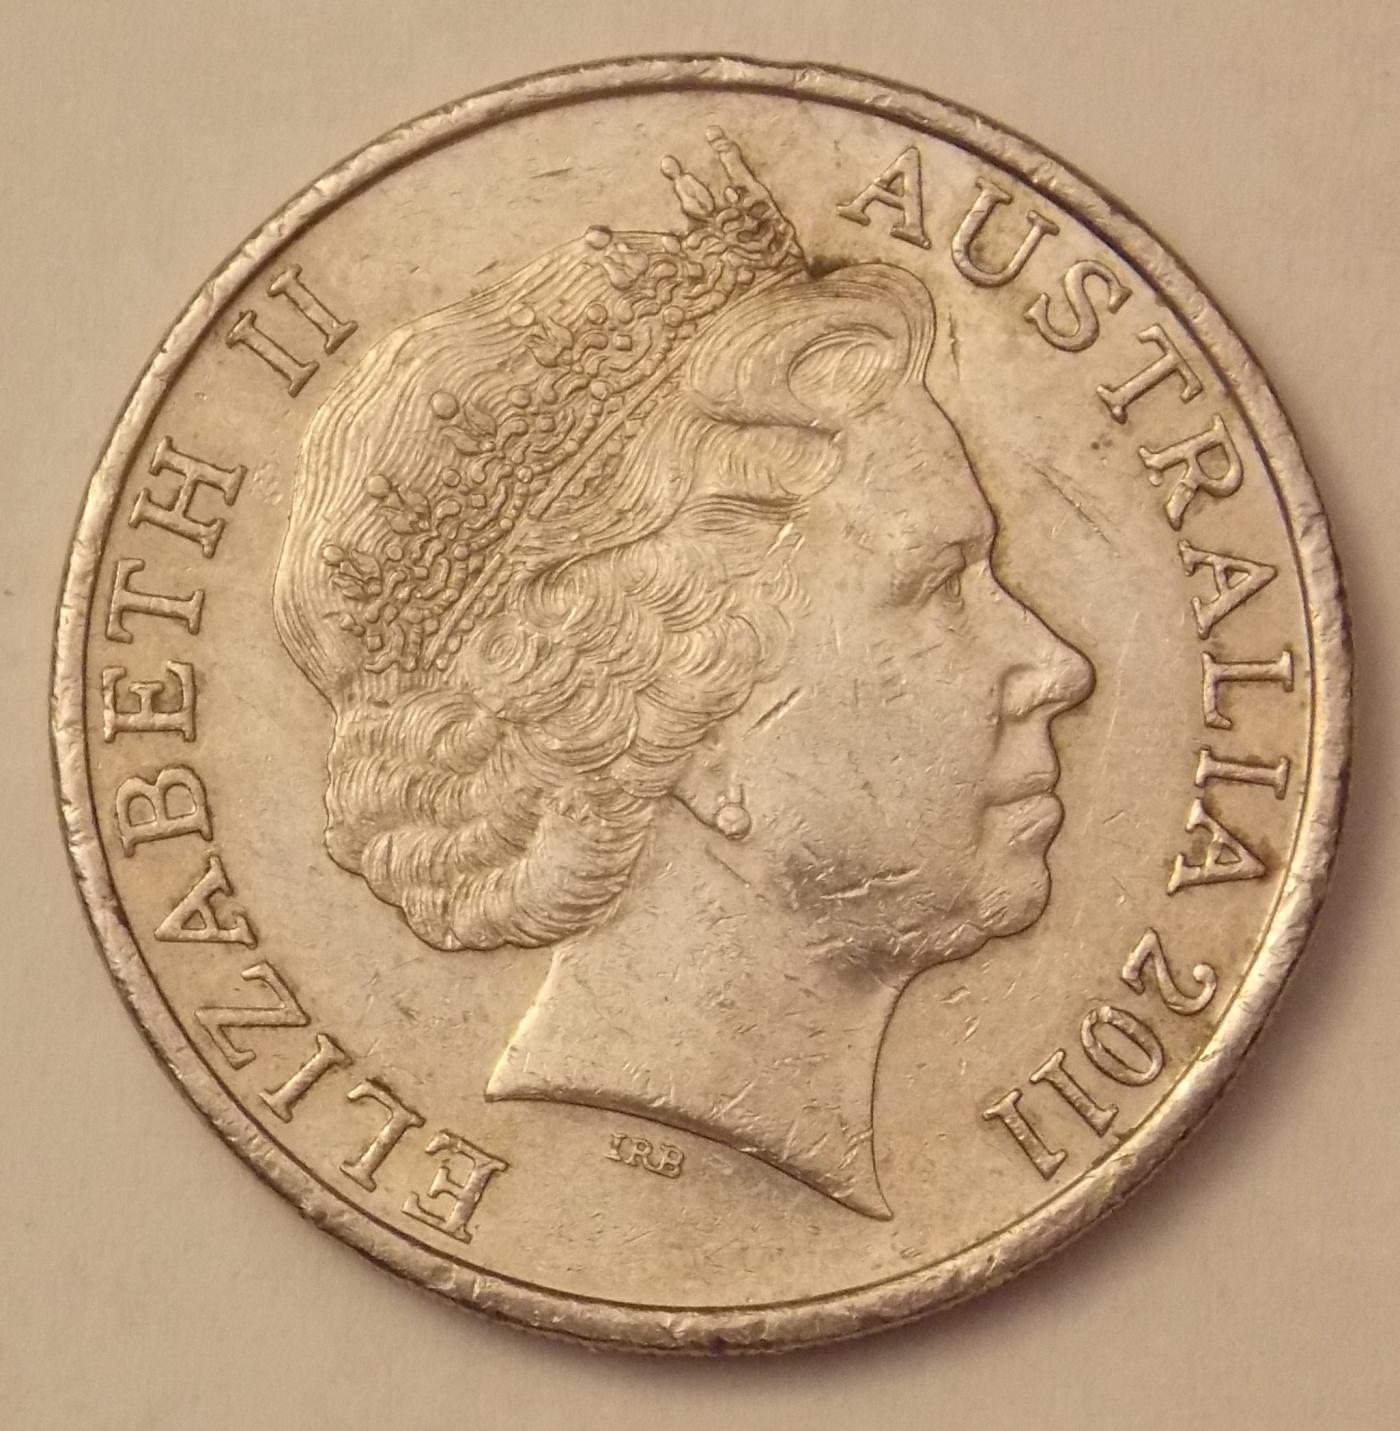 20 Cents 2011 Elizabeth Ii 1952 Present Australia